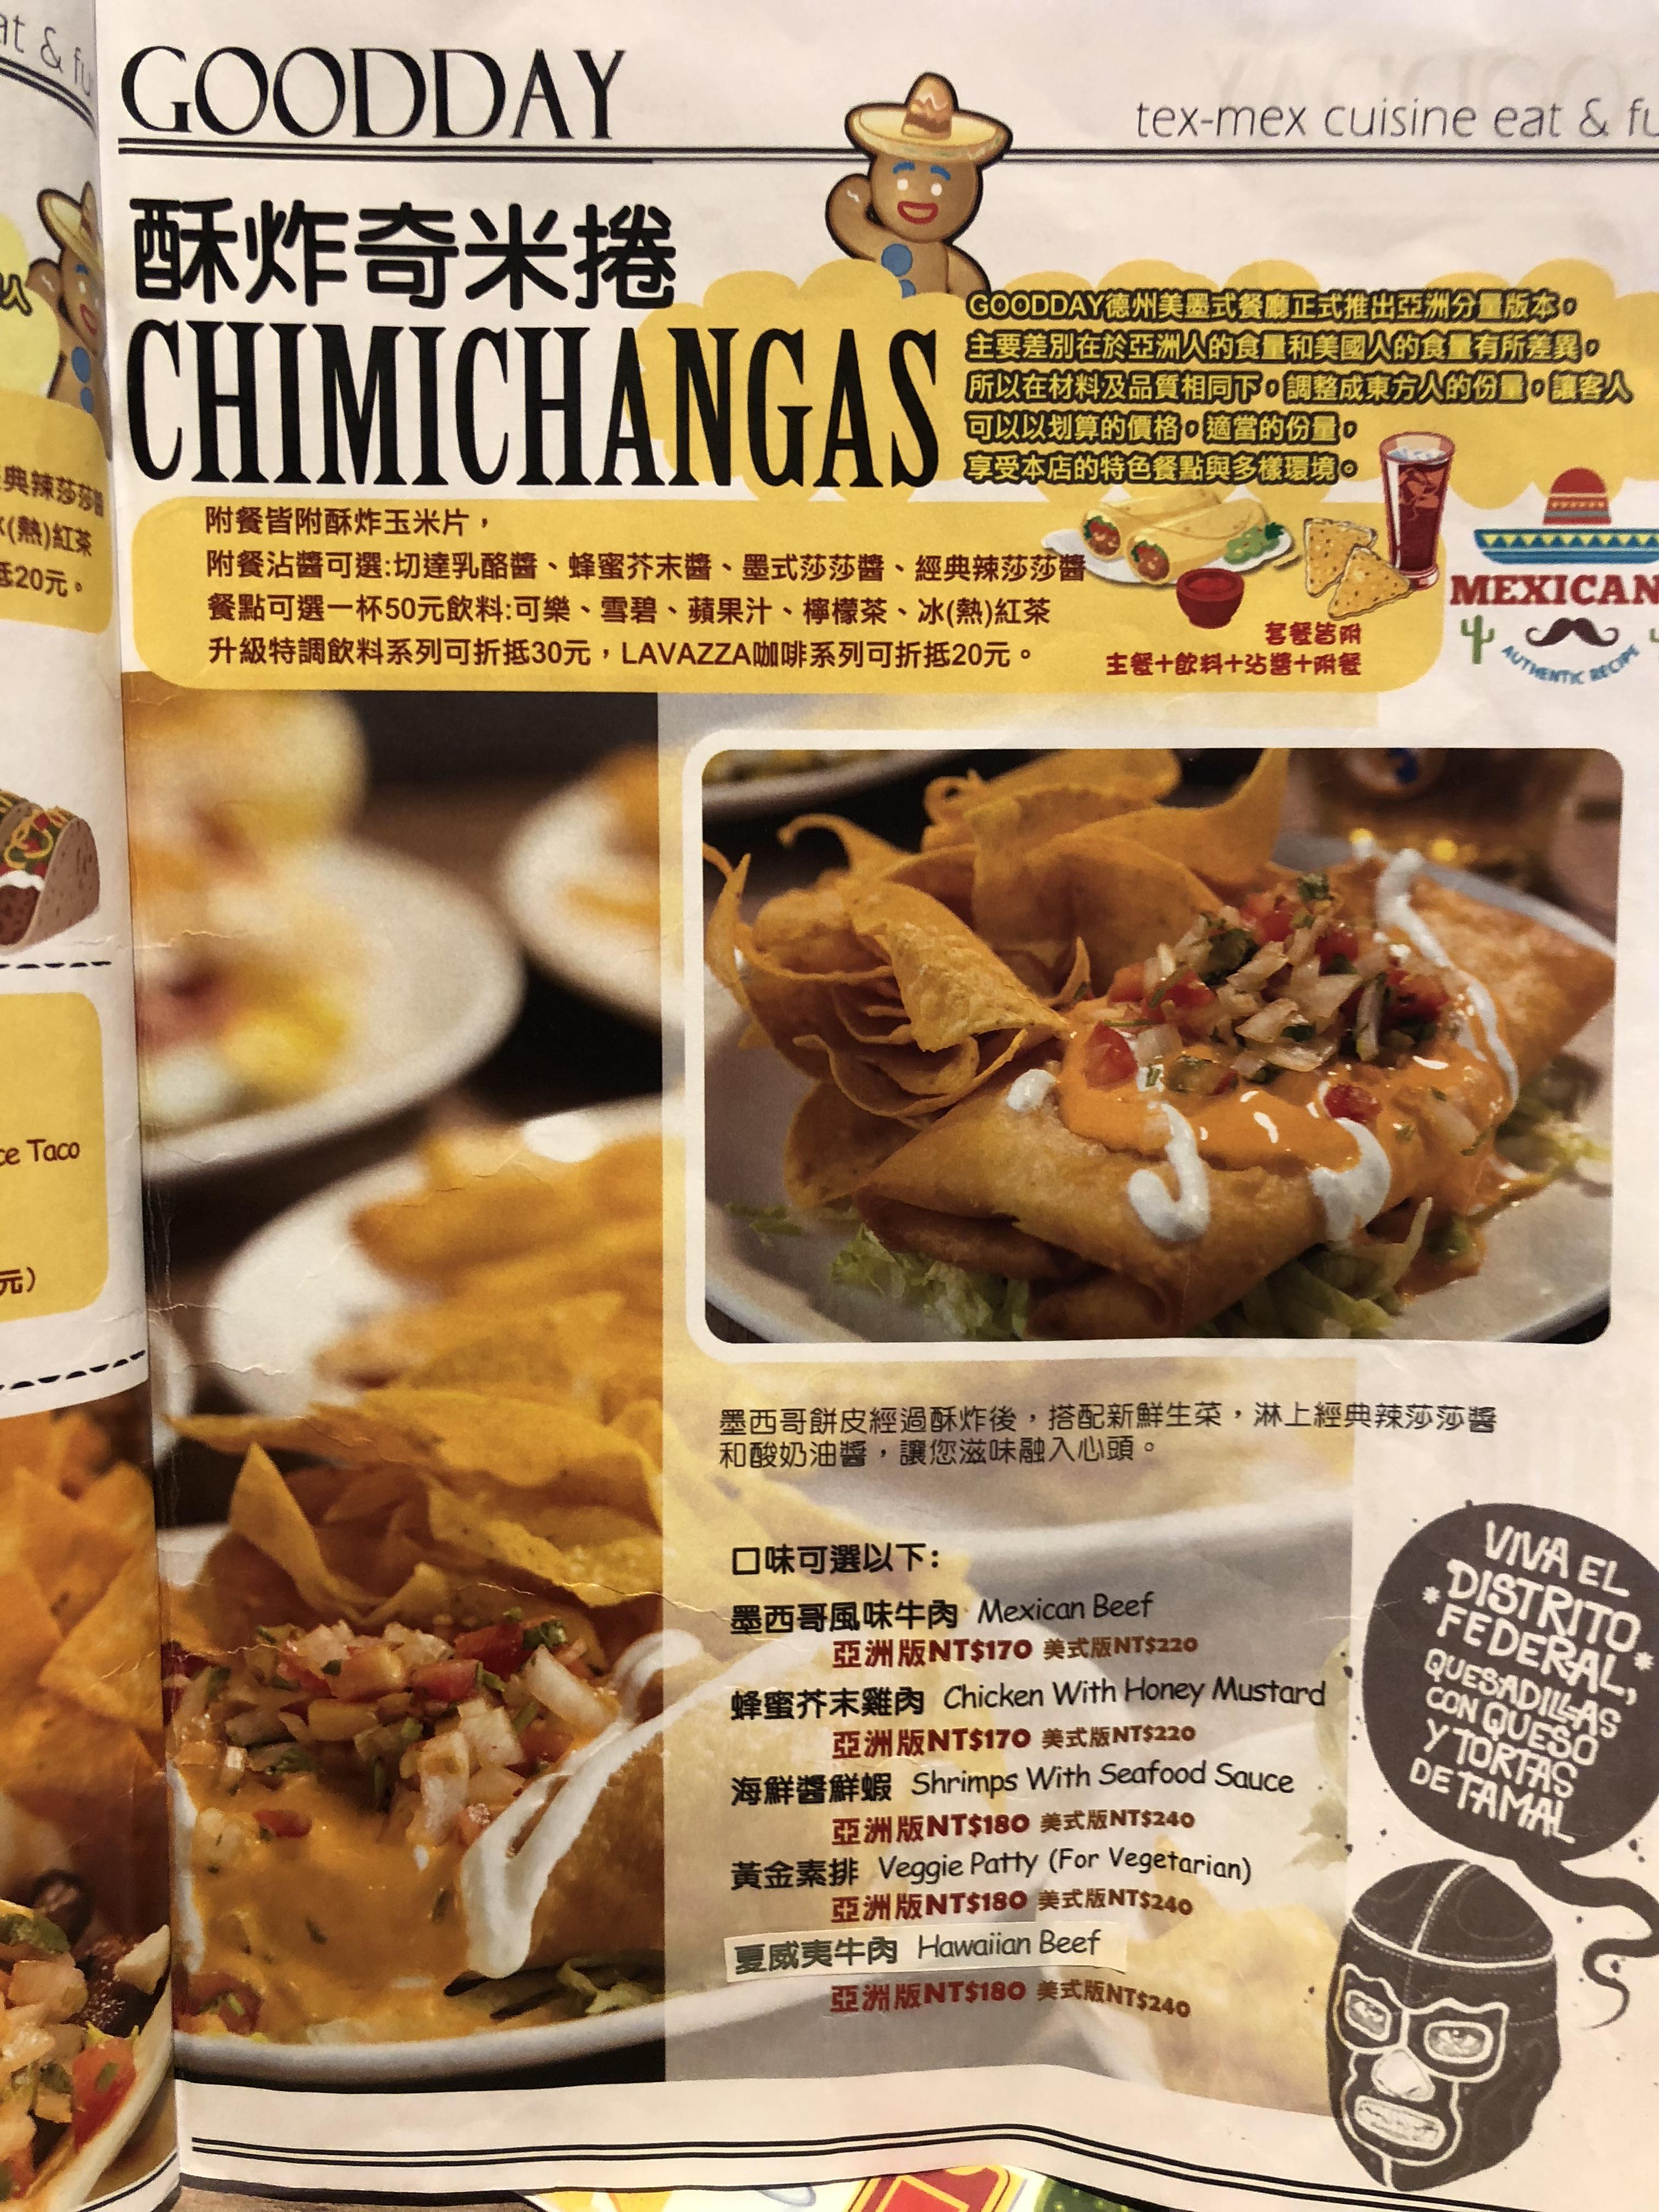 Goodday加州美式墨西哥餐廳菜單